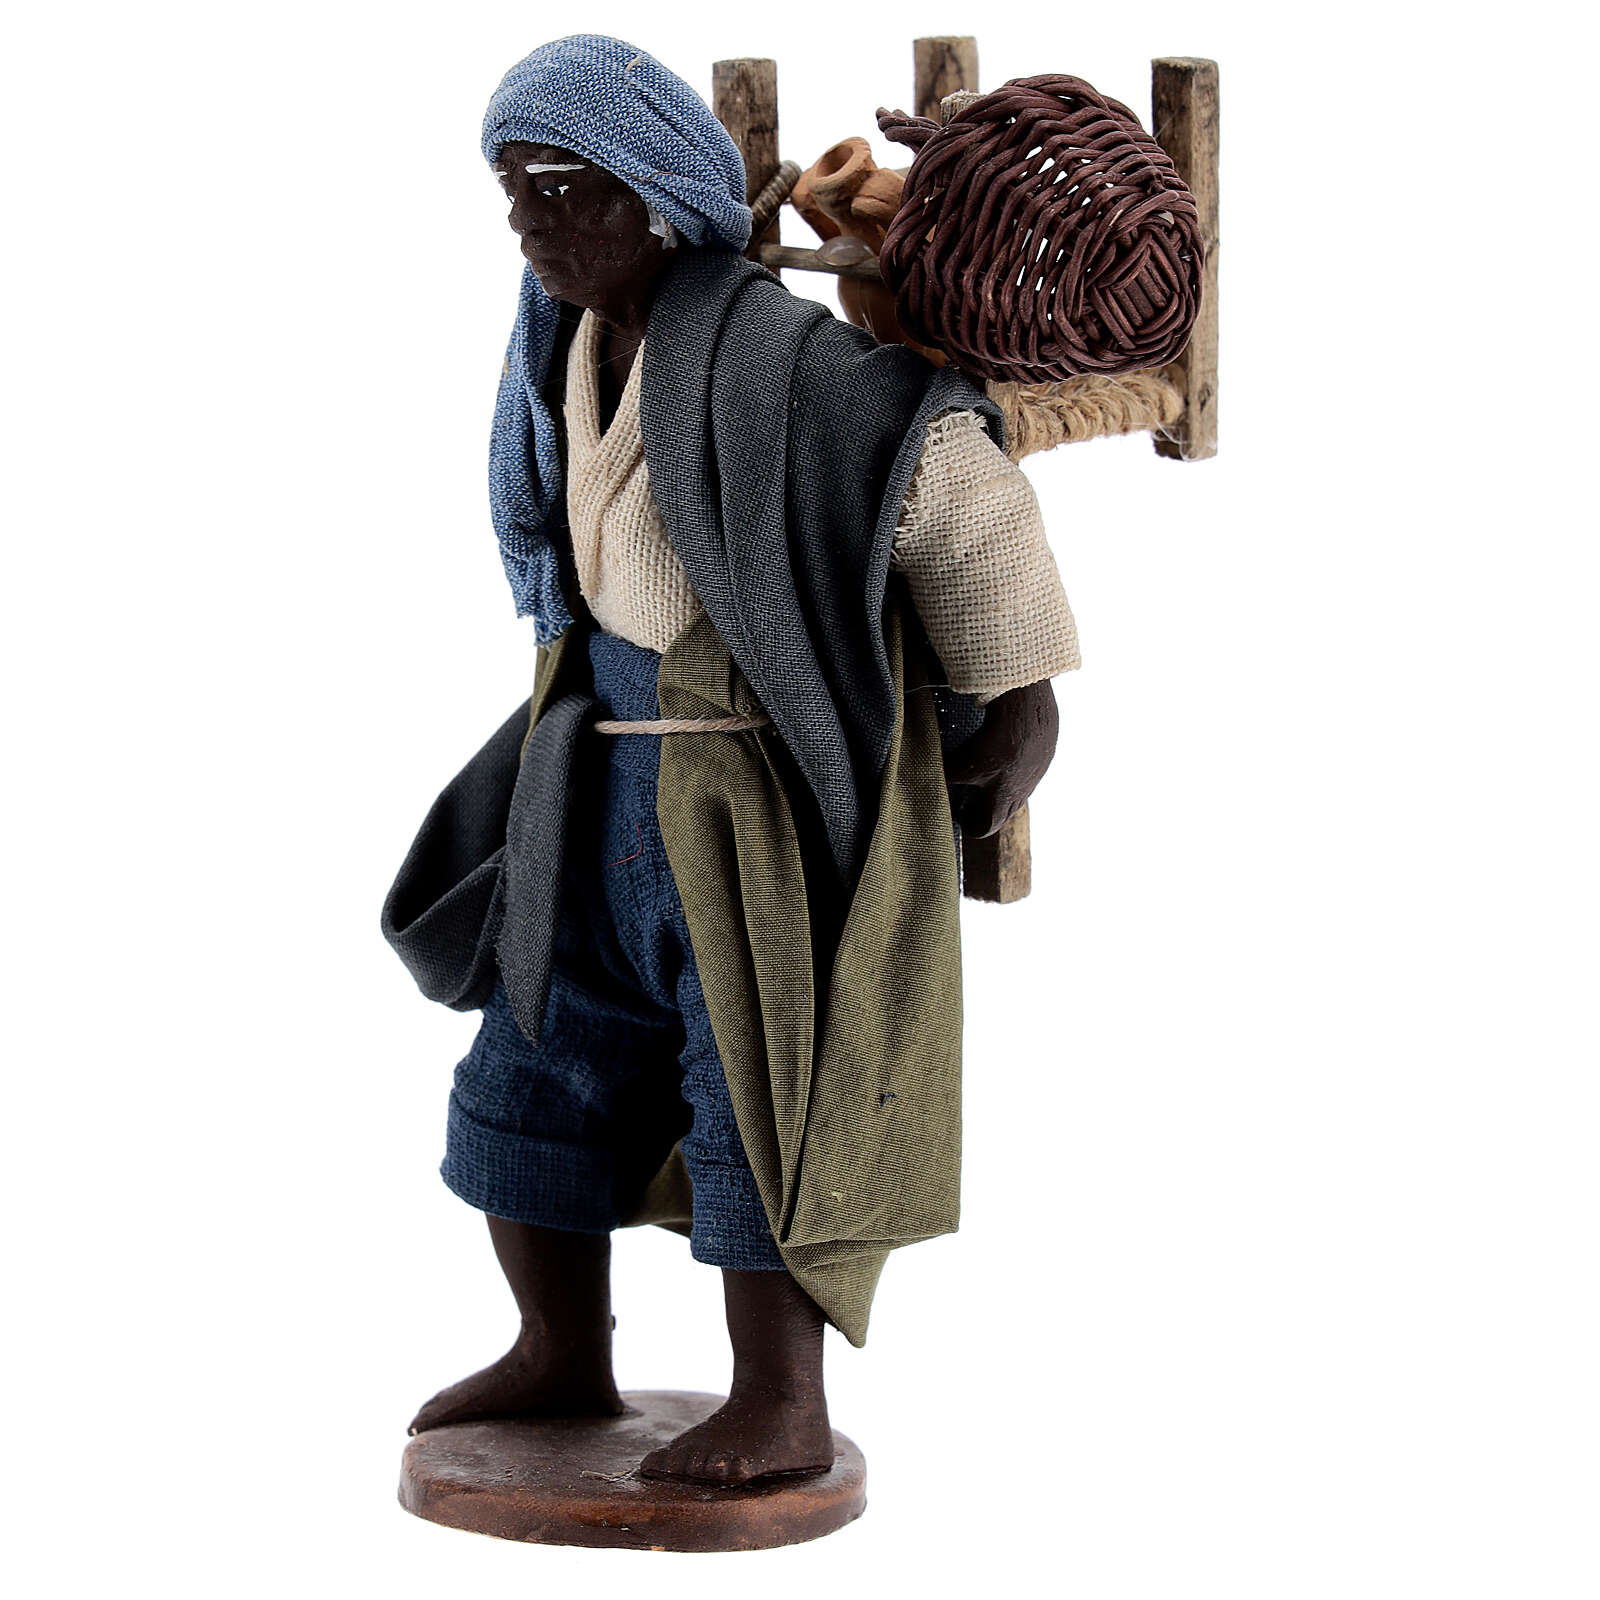 Moor itinerant statue Neapolitan nativity scene figurine 13 cm 4